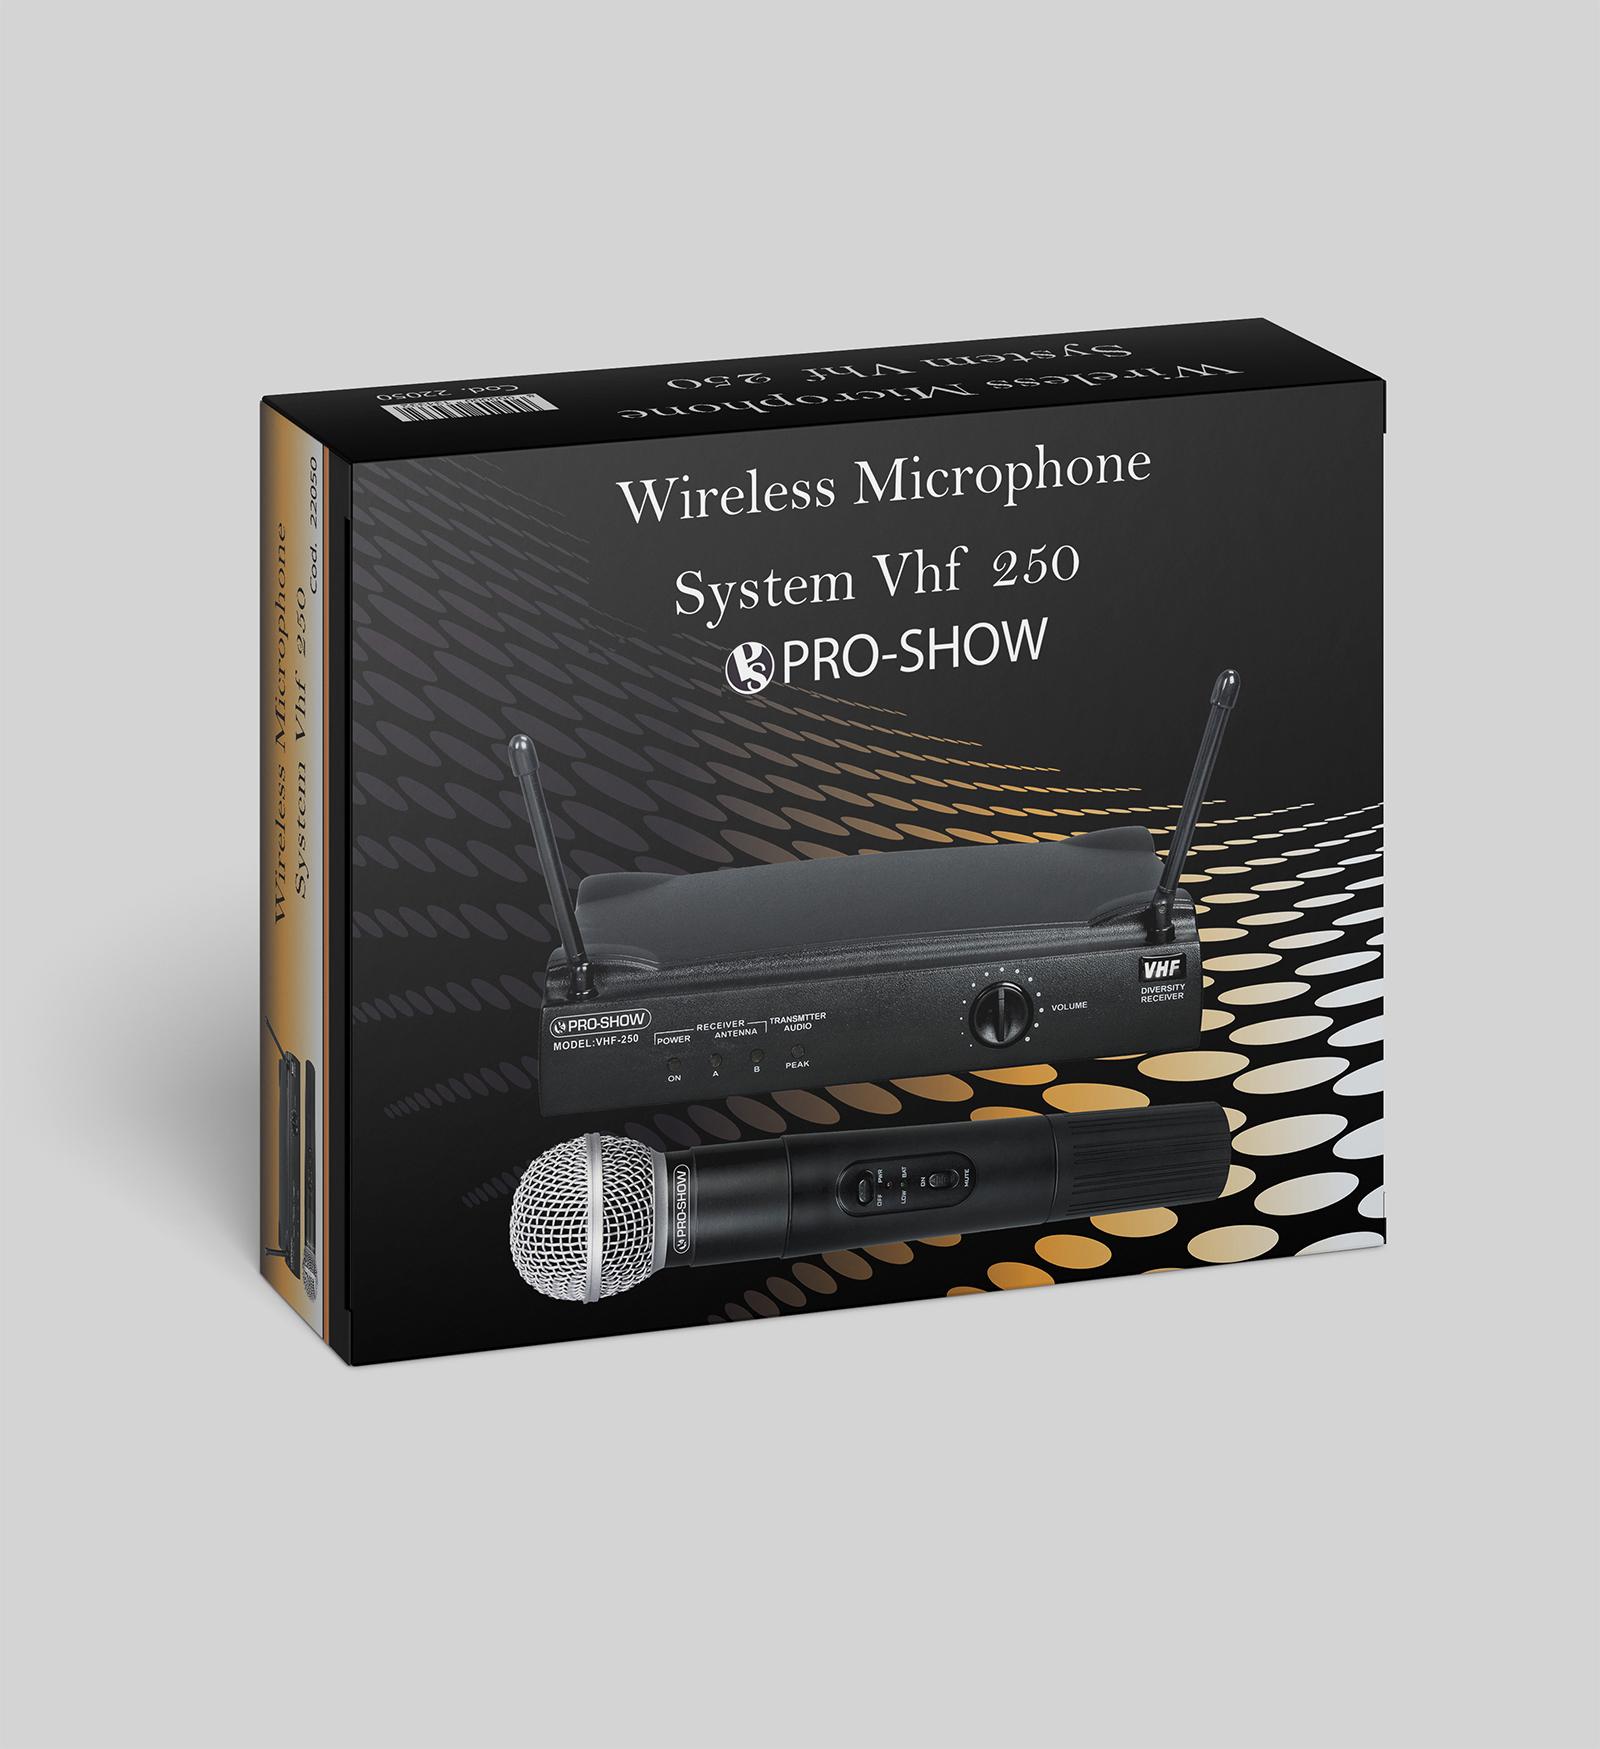 https://www.elisadellachiesa.it/wp-content/uploads/2020/01/Pro-Show-scatola-microfono-1-LOW.jpg